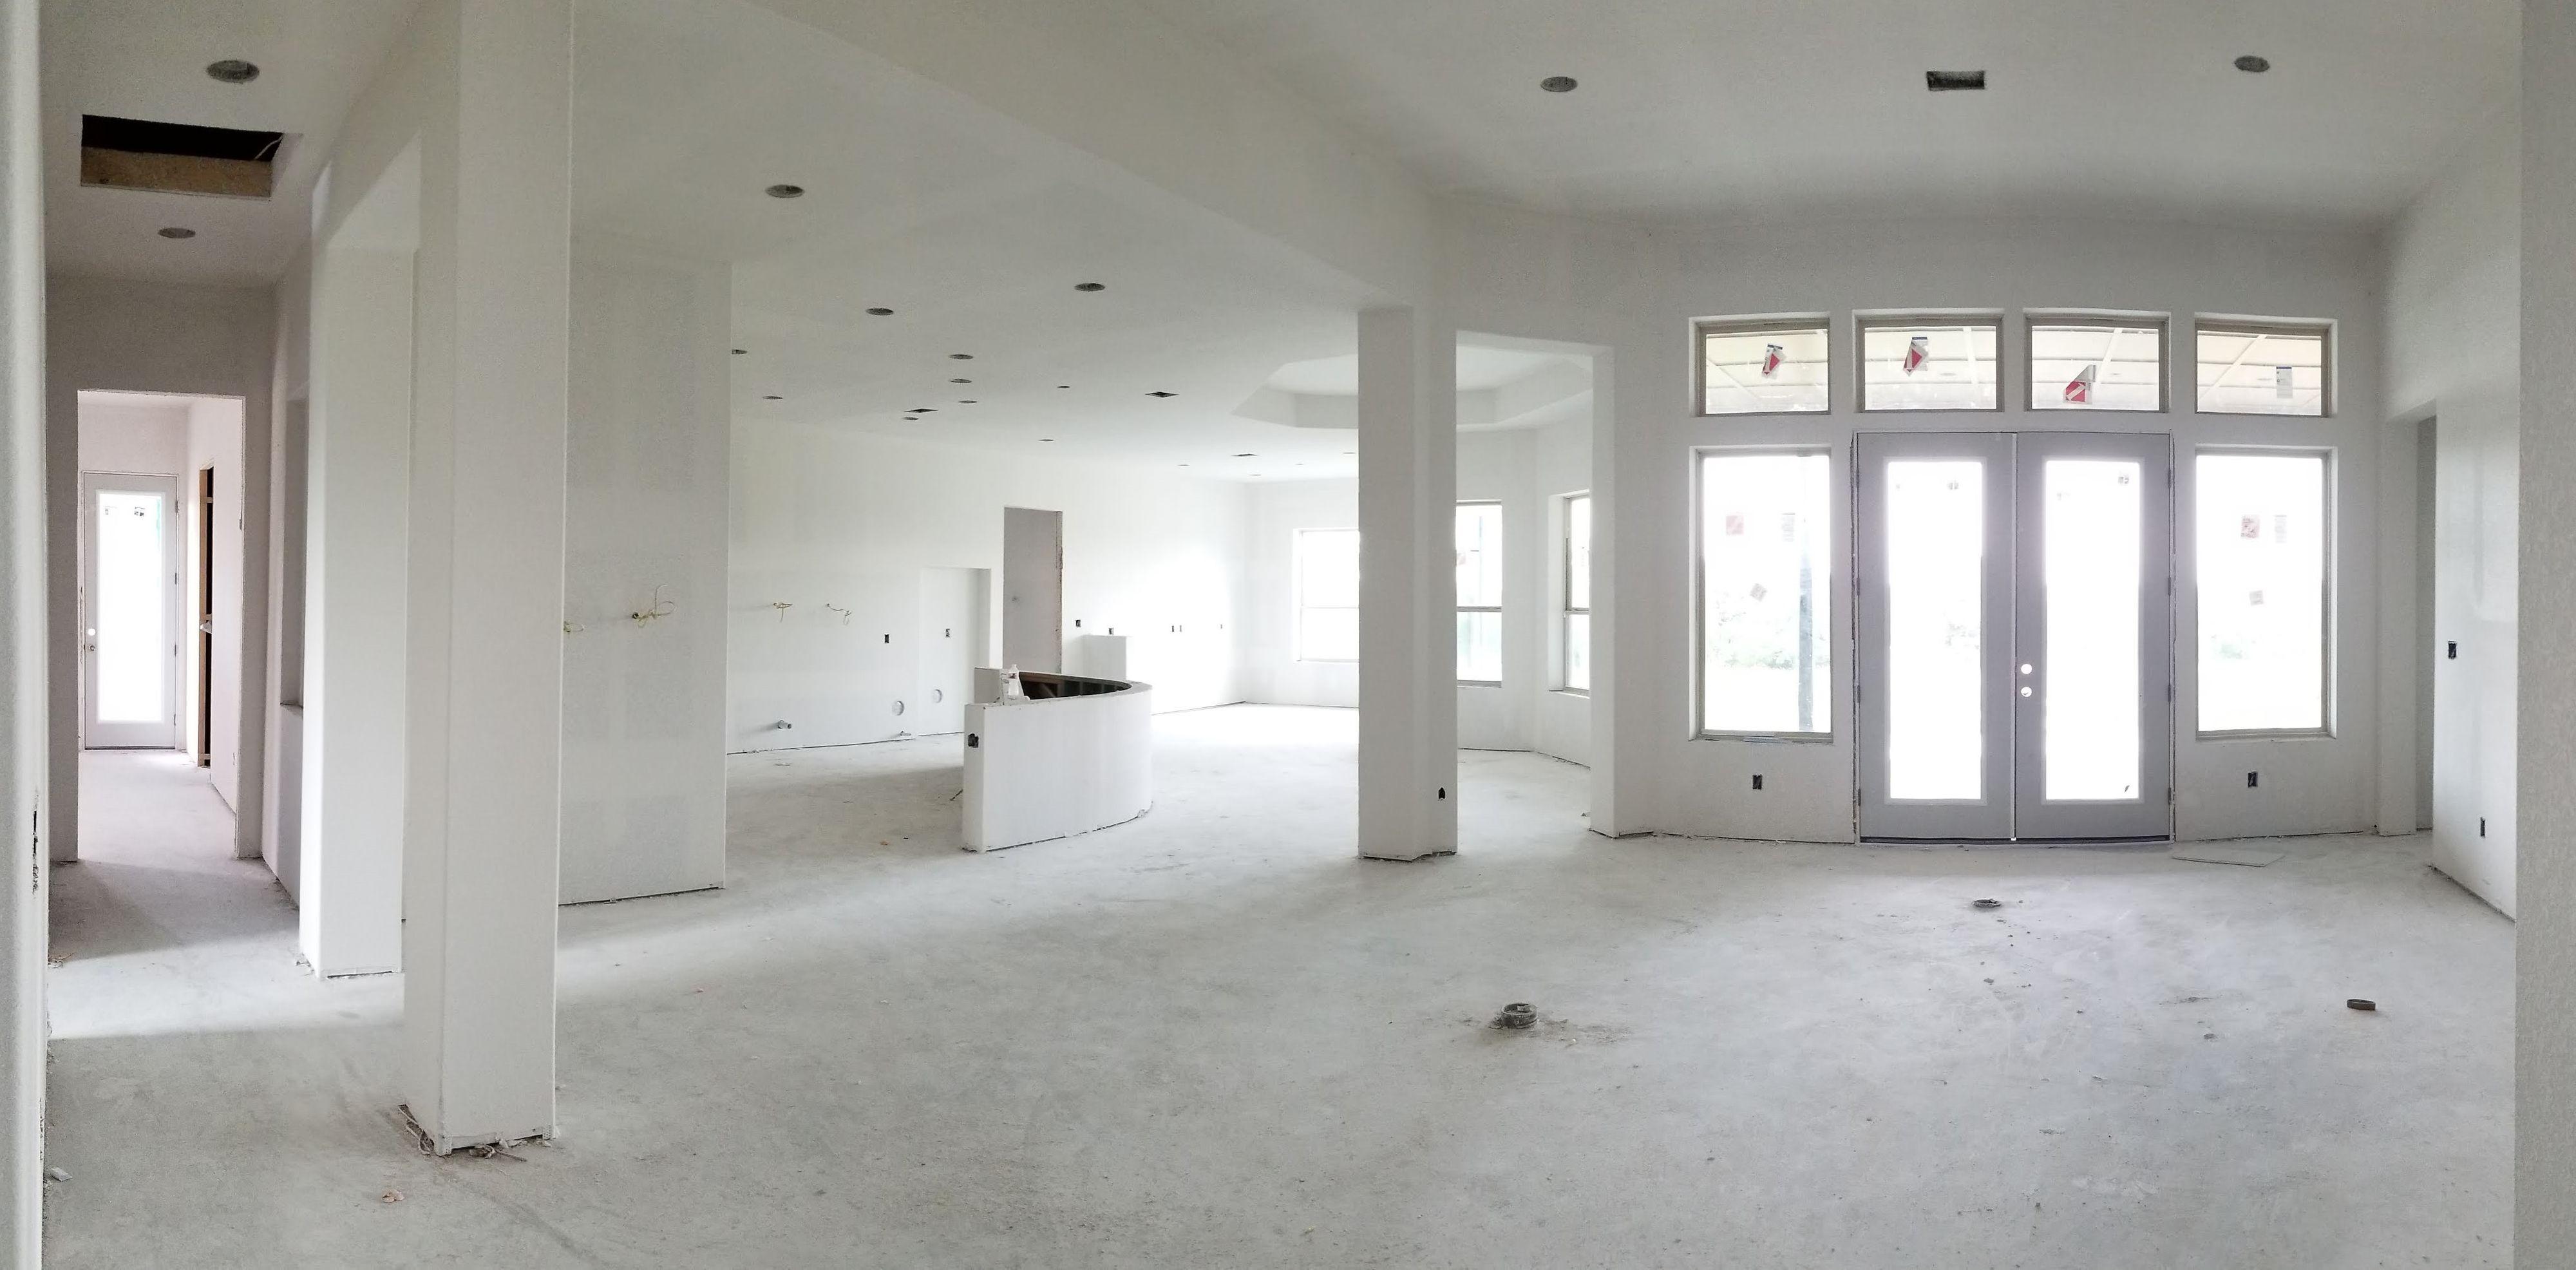 20190617_Drywall Installed.jpg